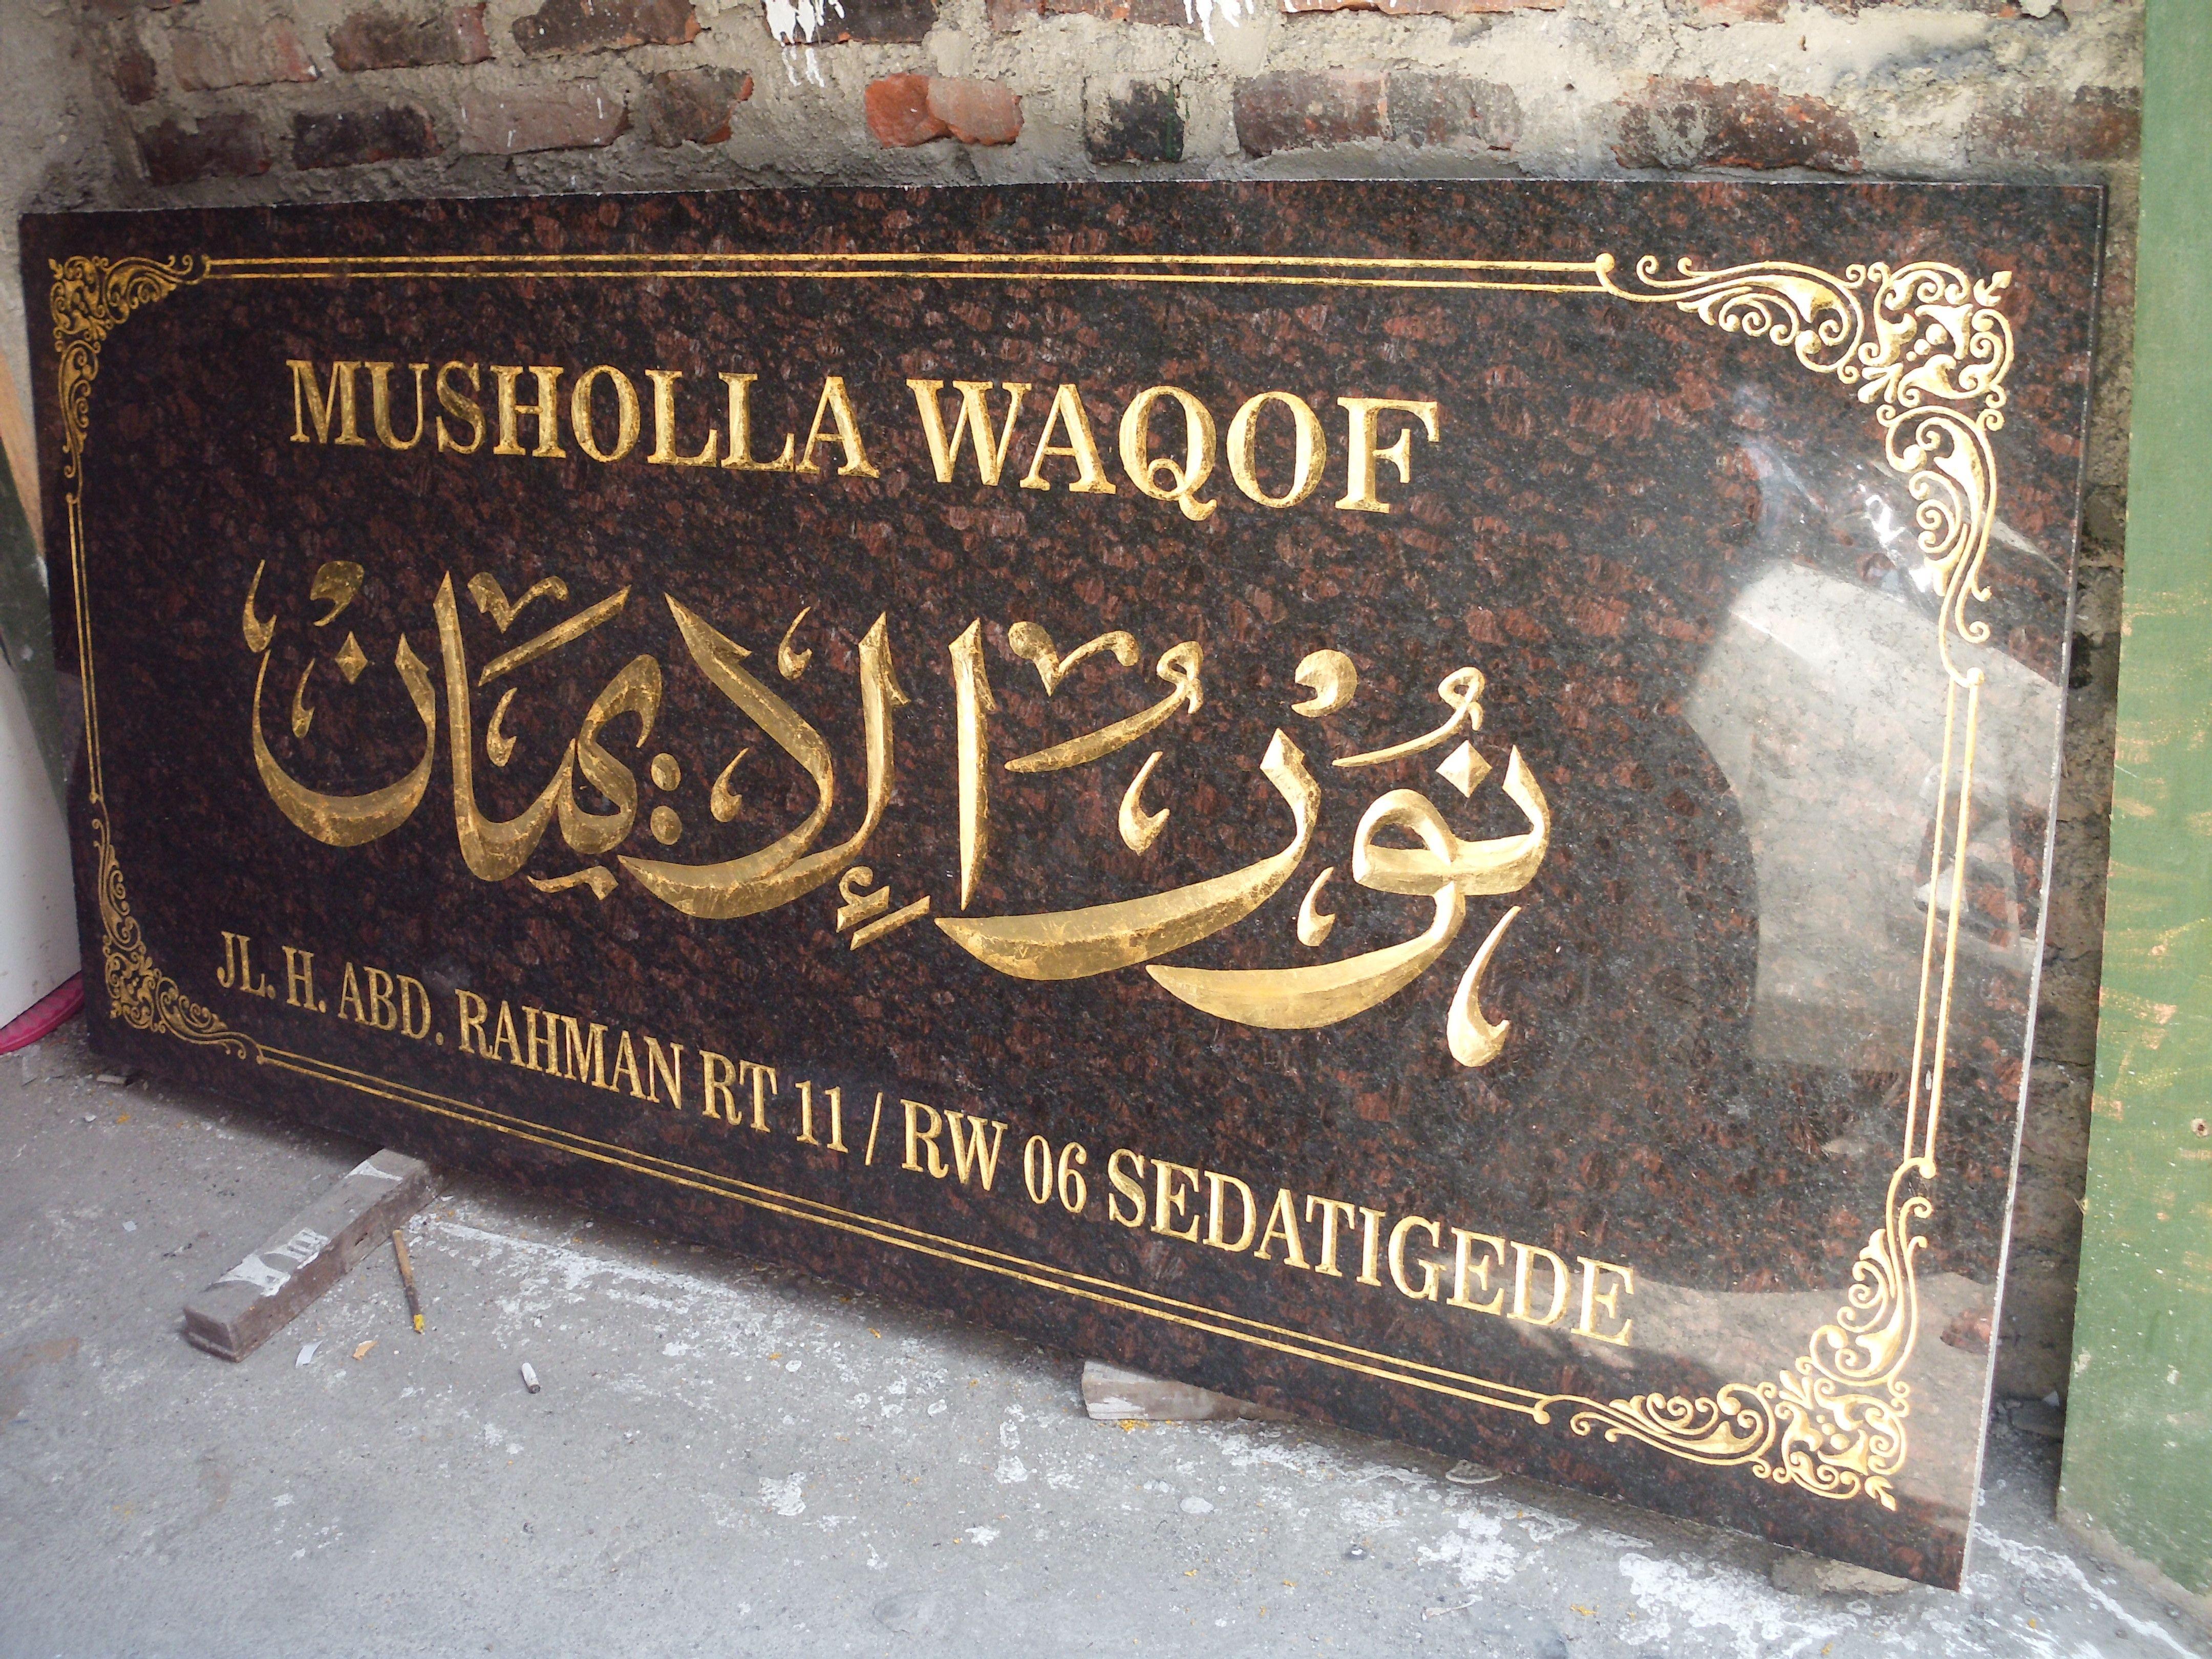 Papan nama masjid, papan nama sekolah, papan nama. Papan